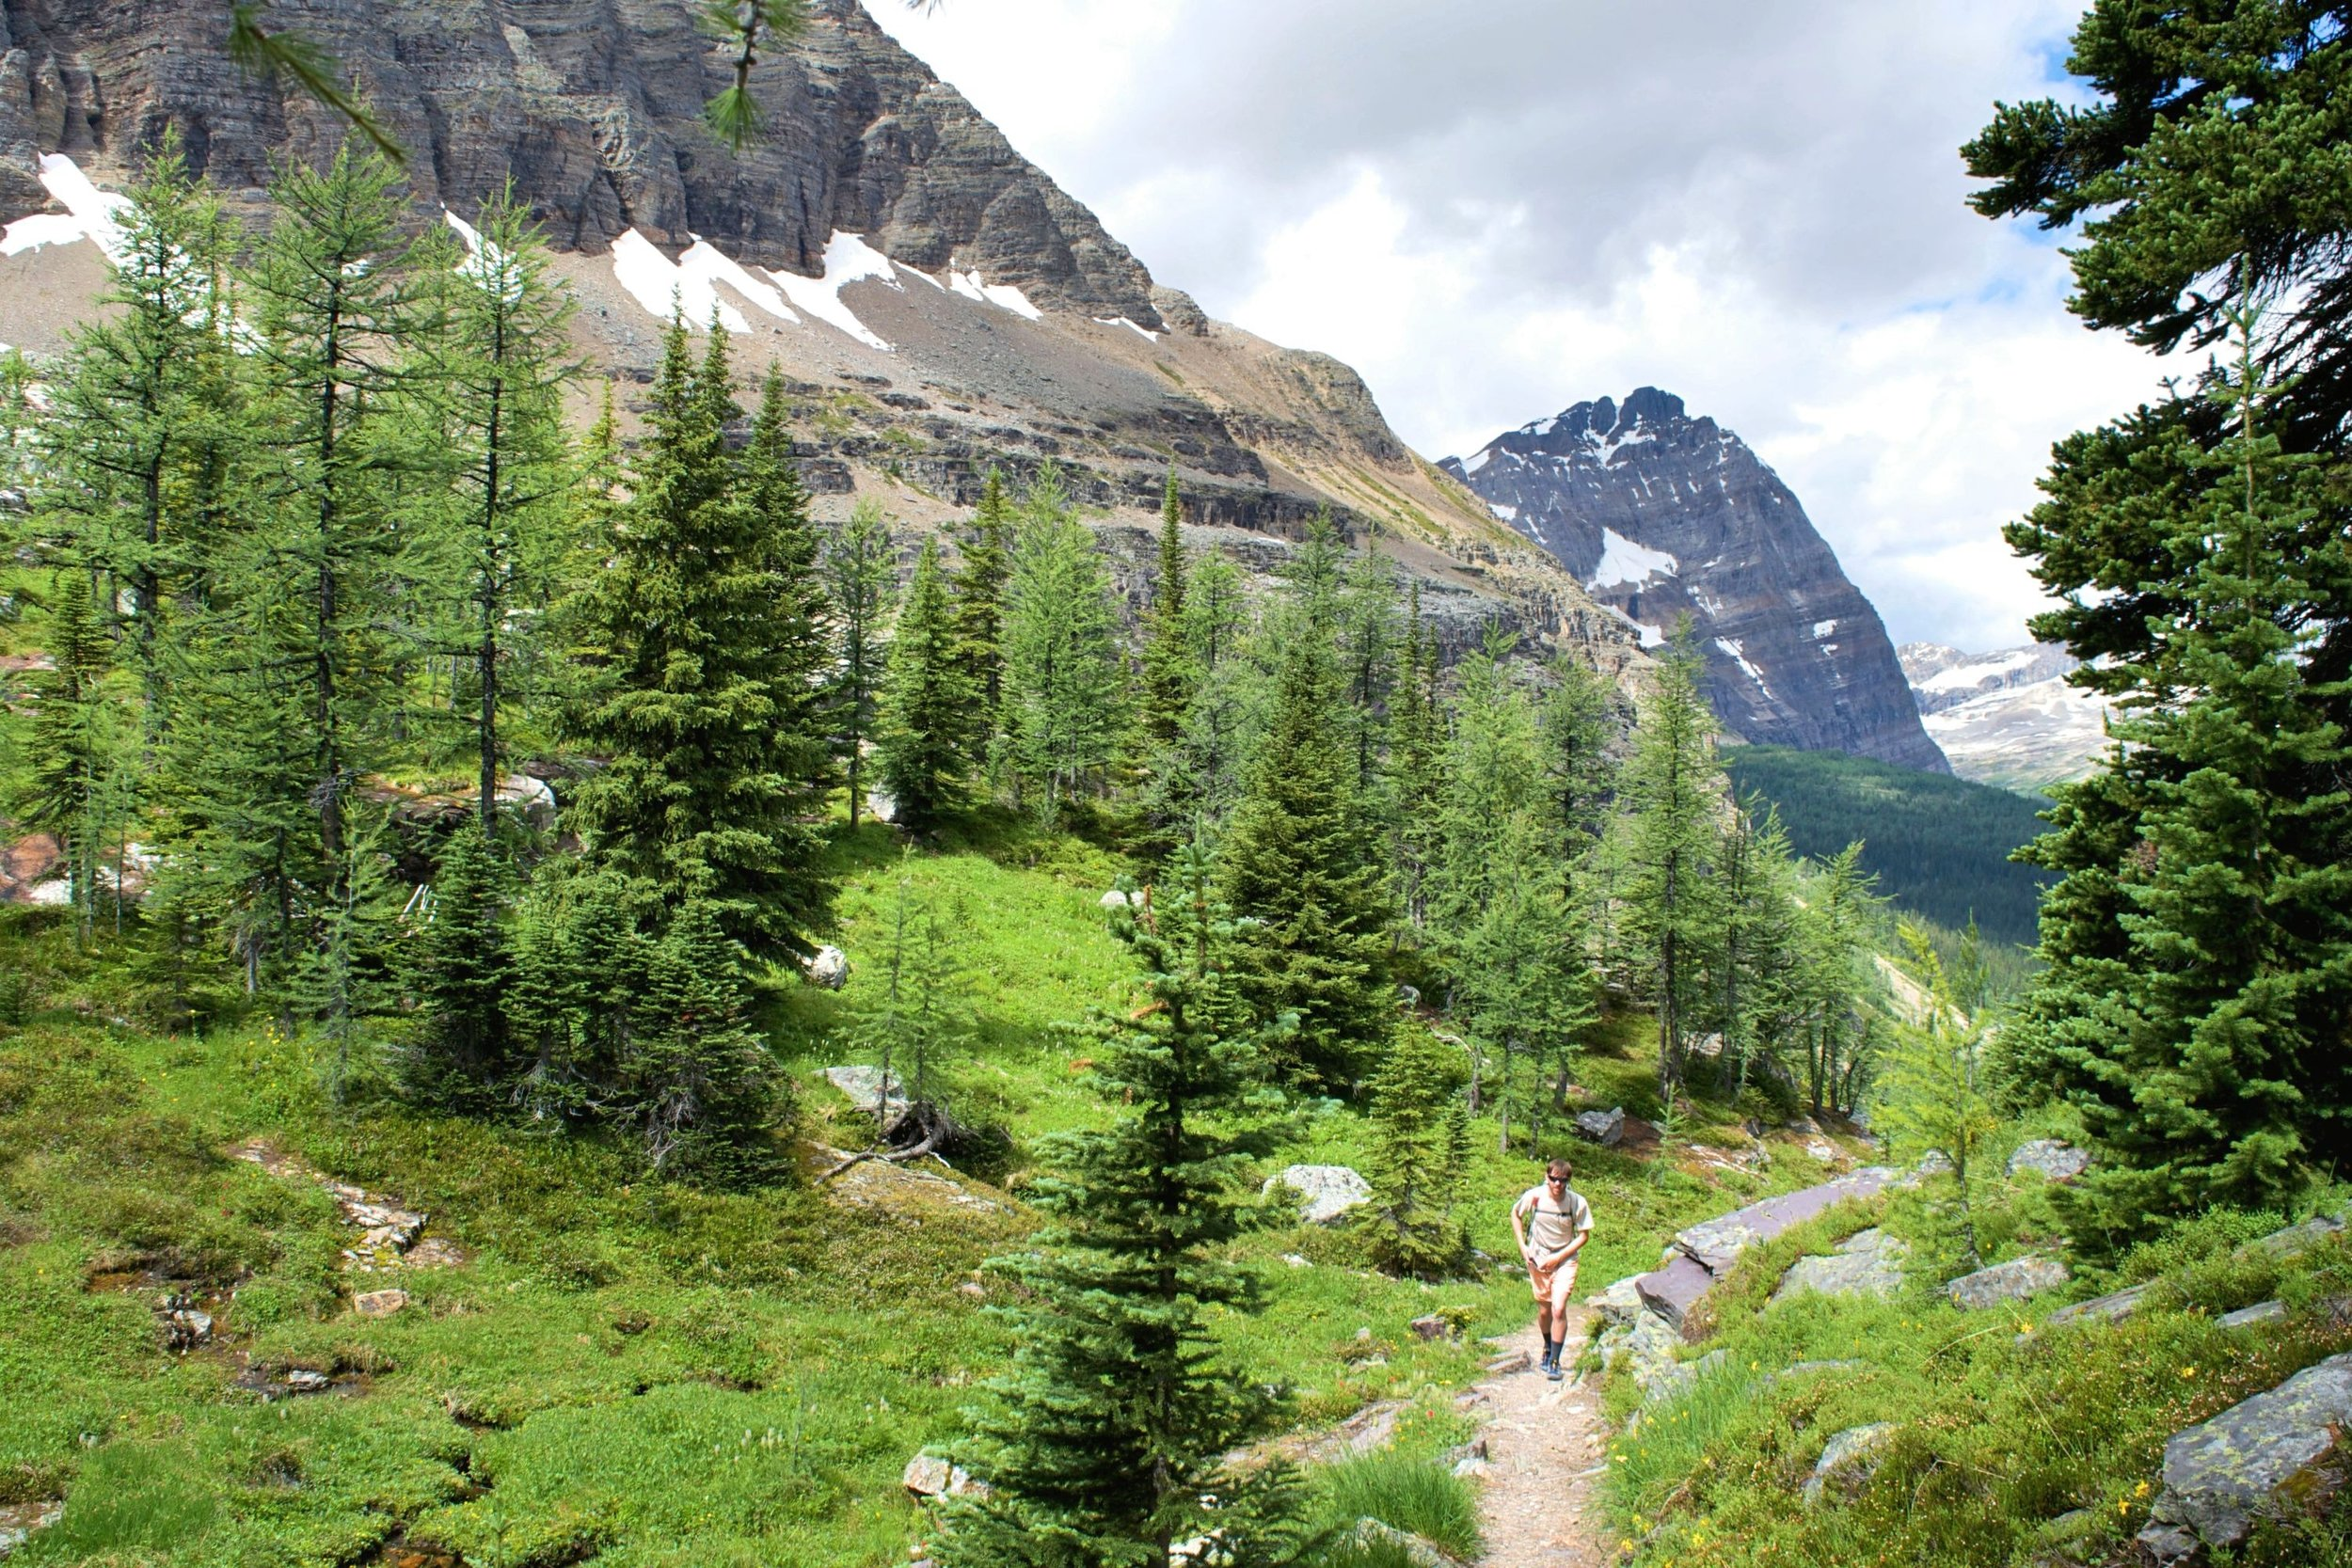 Hiking up into Opabin Pass